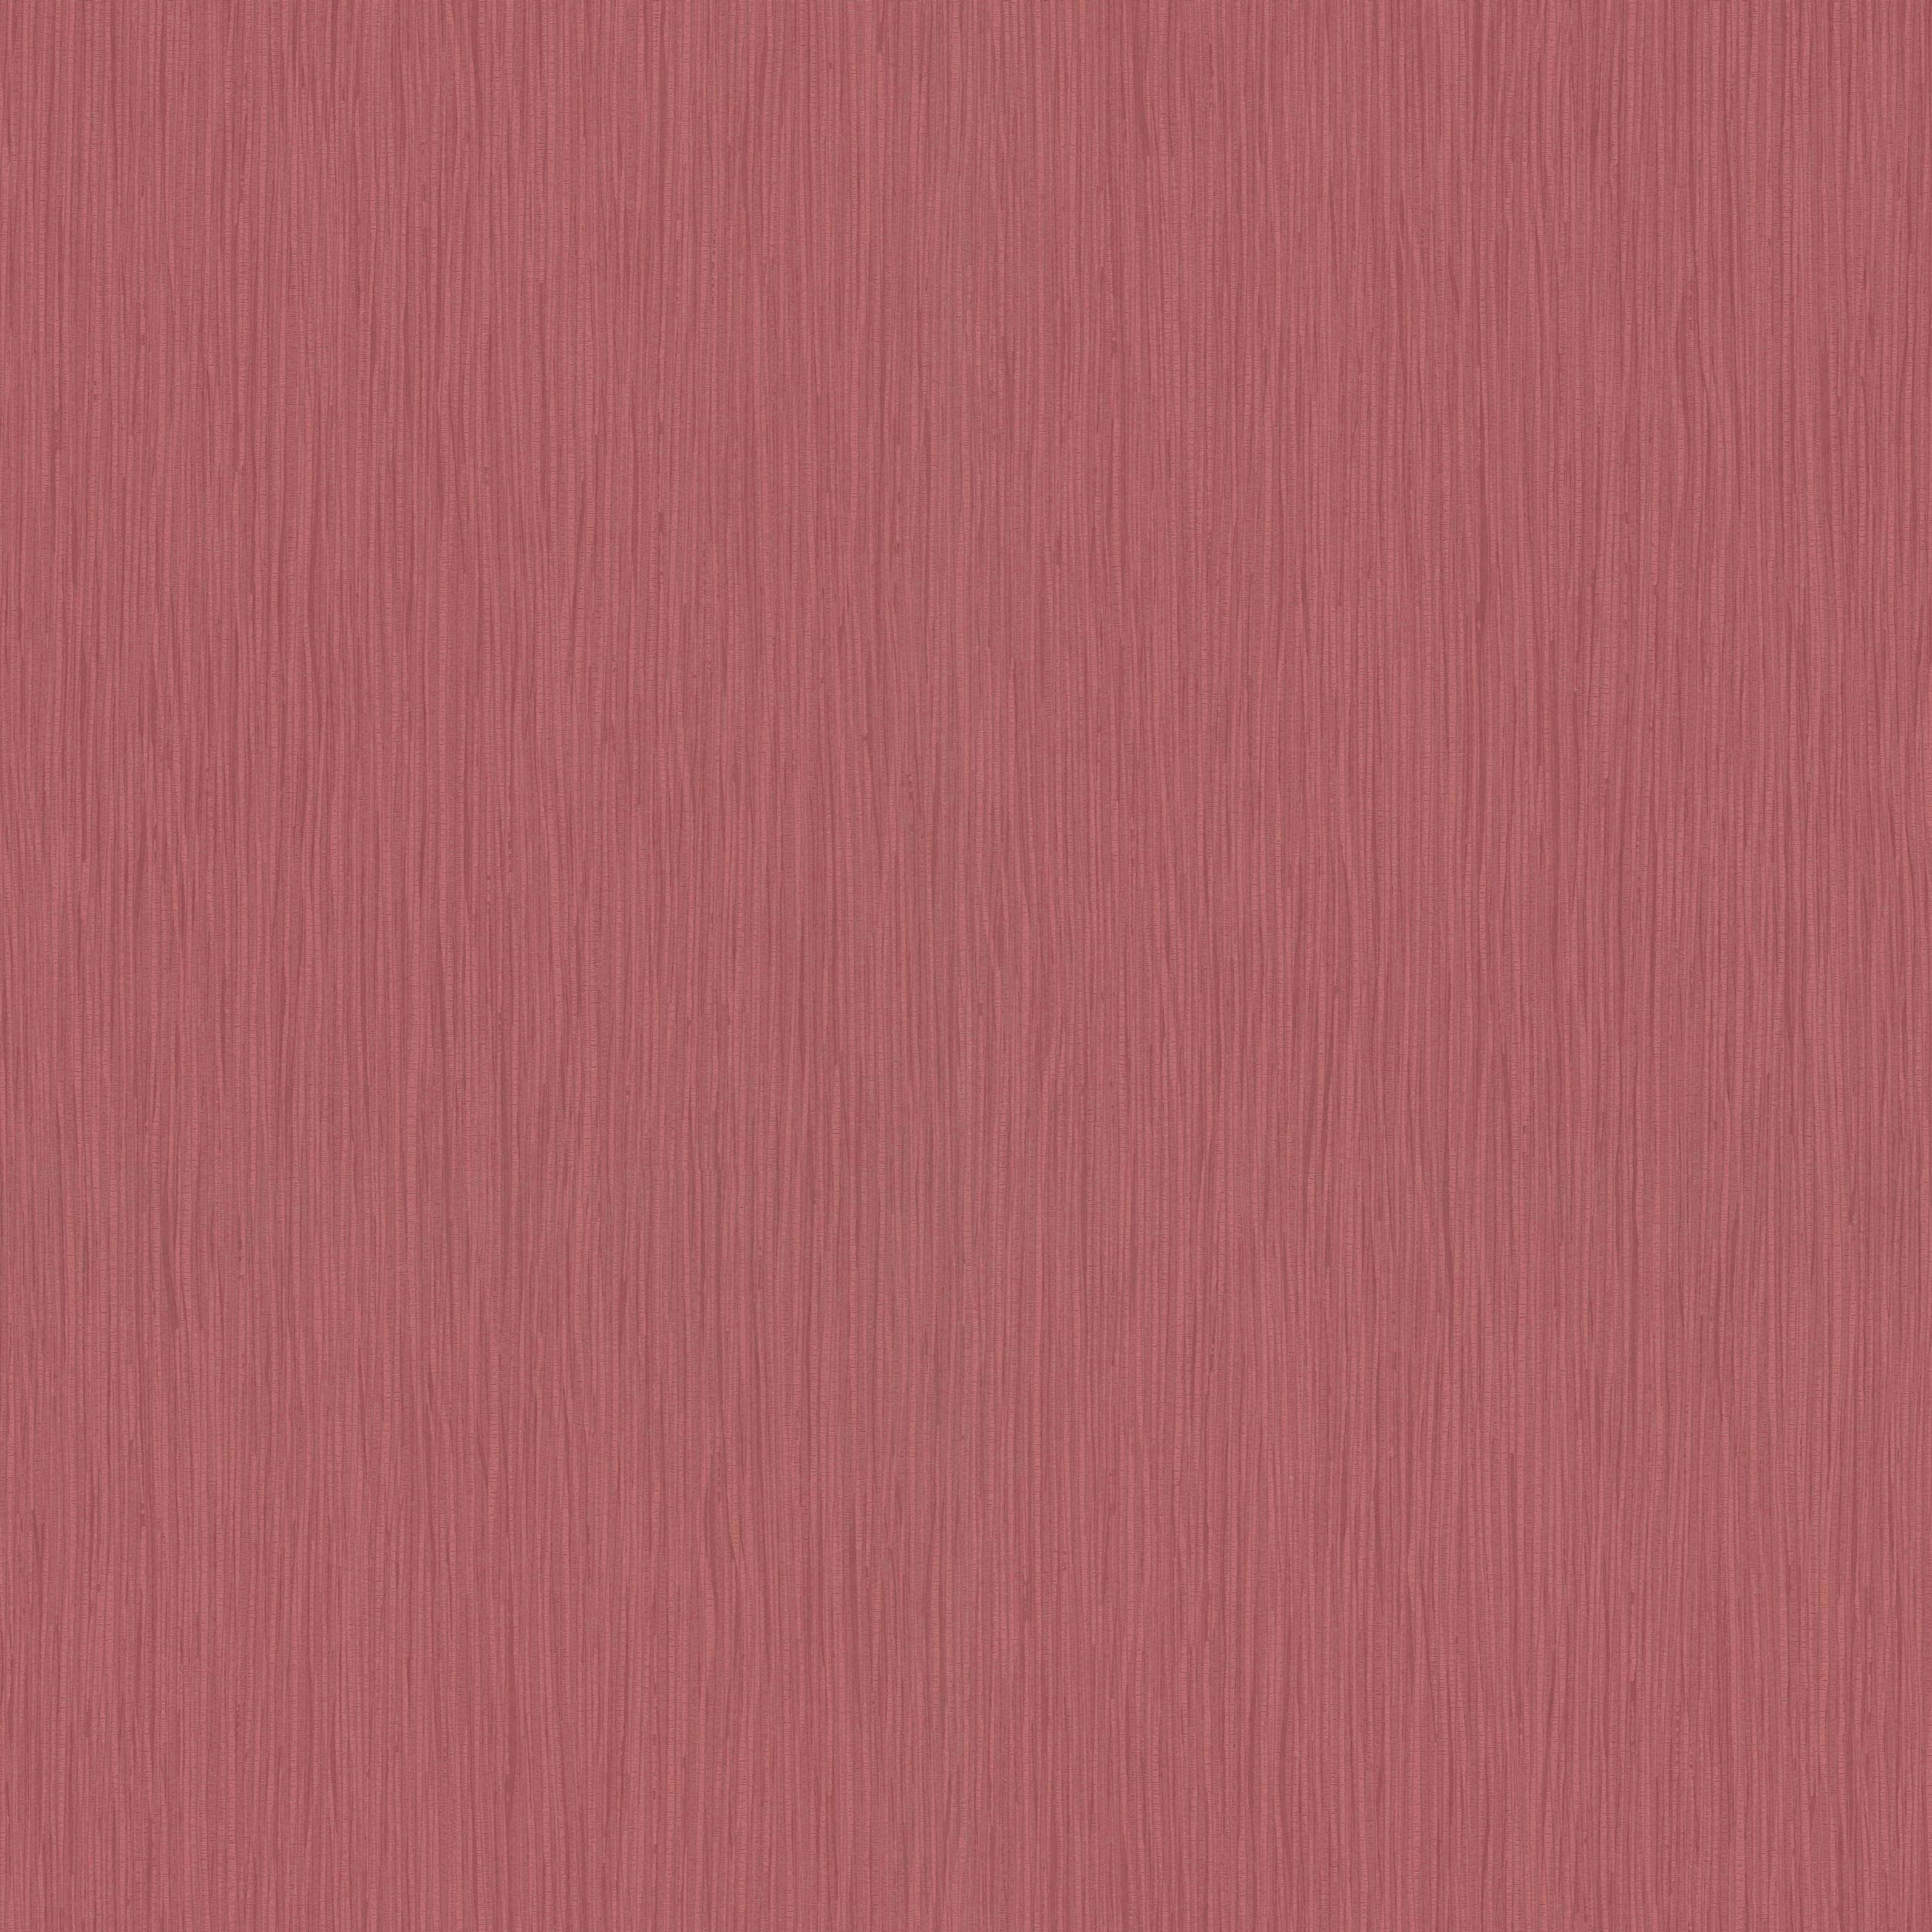 Binkele Farben, Lacke & Tapeten Onlinehandel - Marburg KUNTERBUNT 56521